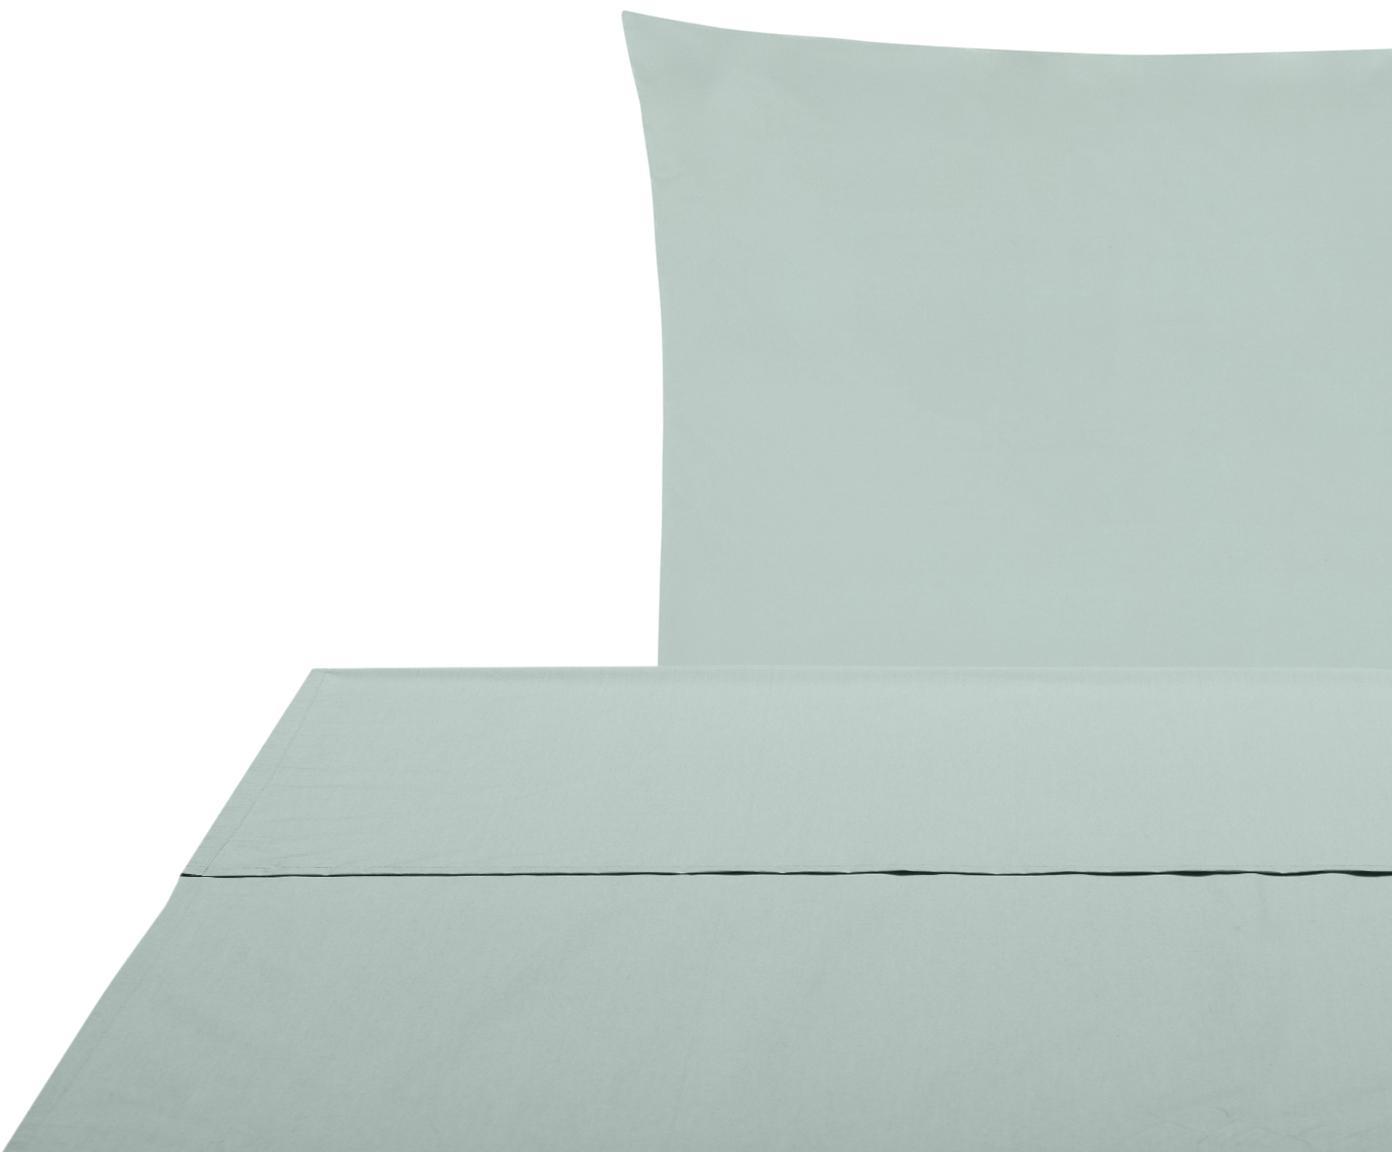 Set lenzuola in percalle Elsie 2 pz, Tessuto: percalle Densità del filo, Verde salvia, 150 x 300 cm